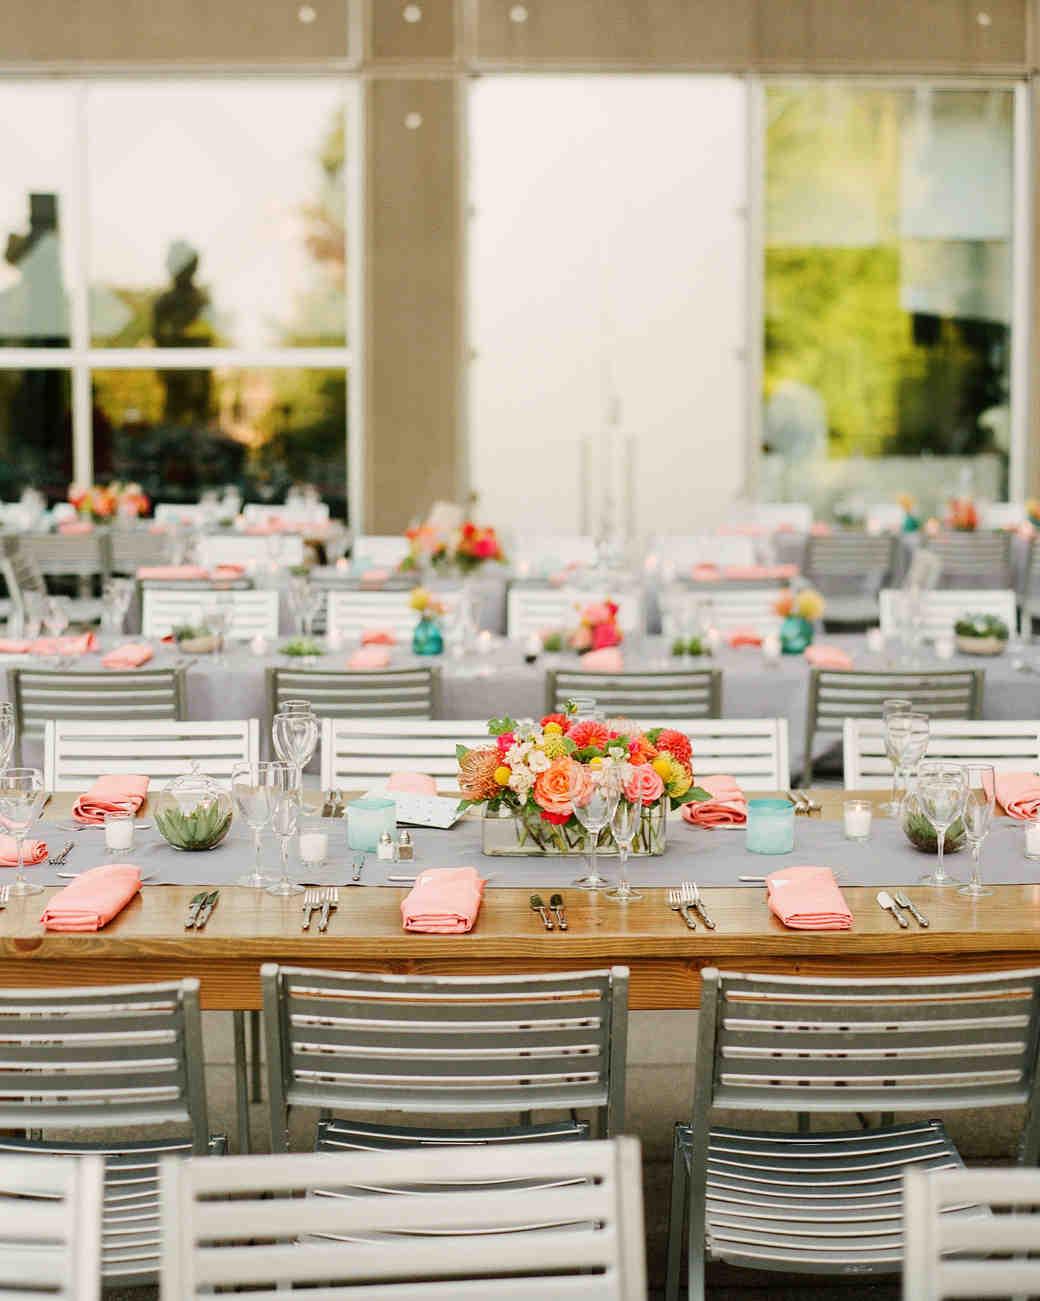 christina-jimmy-wedding-tables-8050.jpg